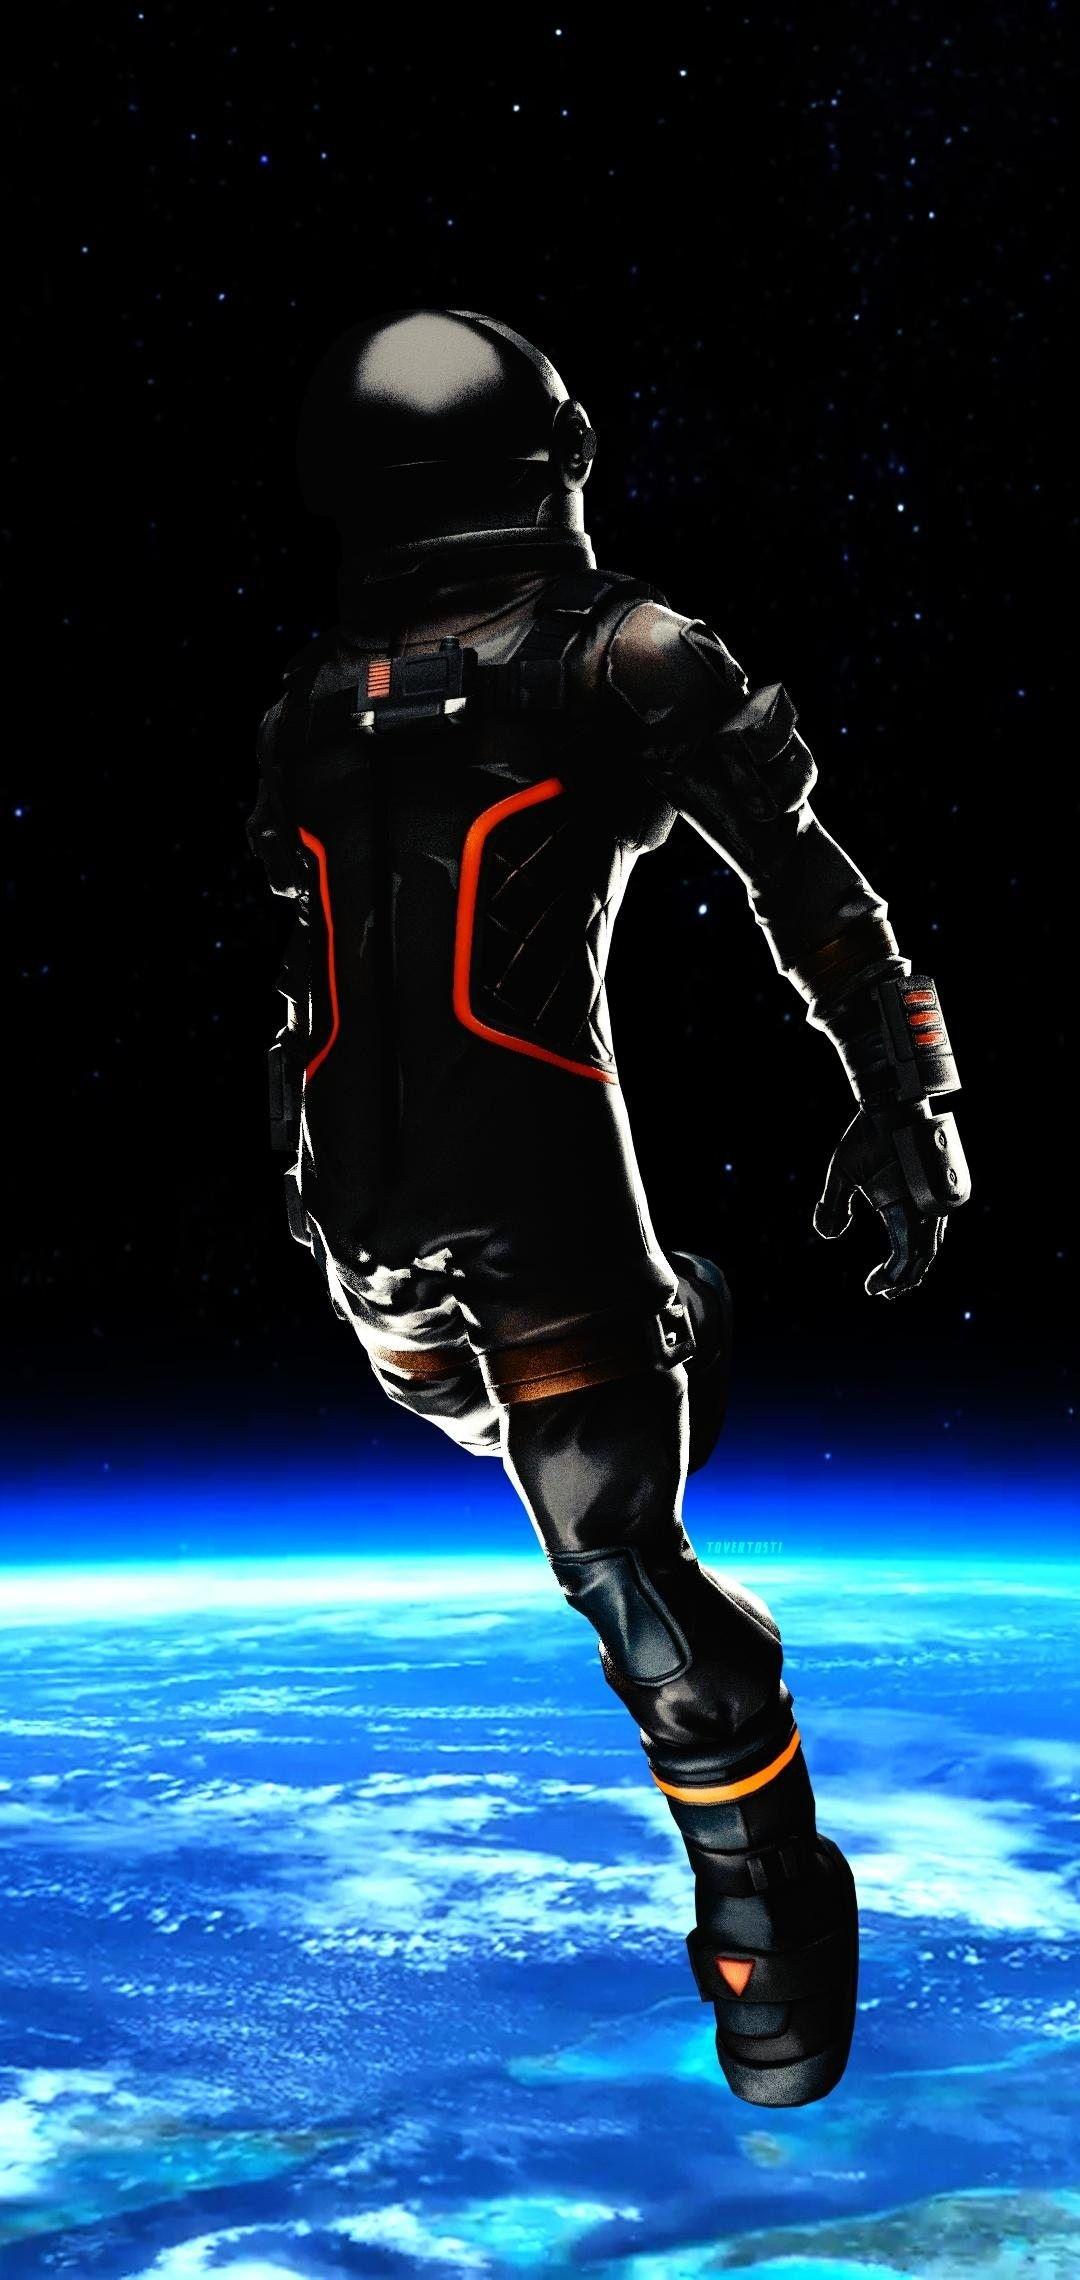 Fortnite Dark Voyager Astronaut Wallpaper Fortnite Black Astronauts